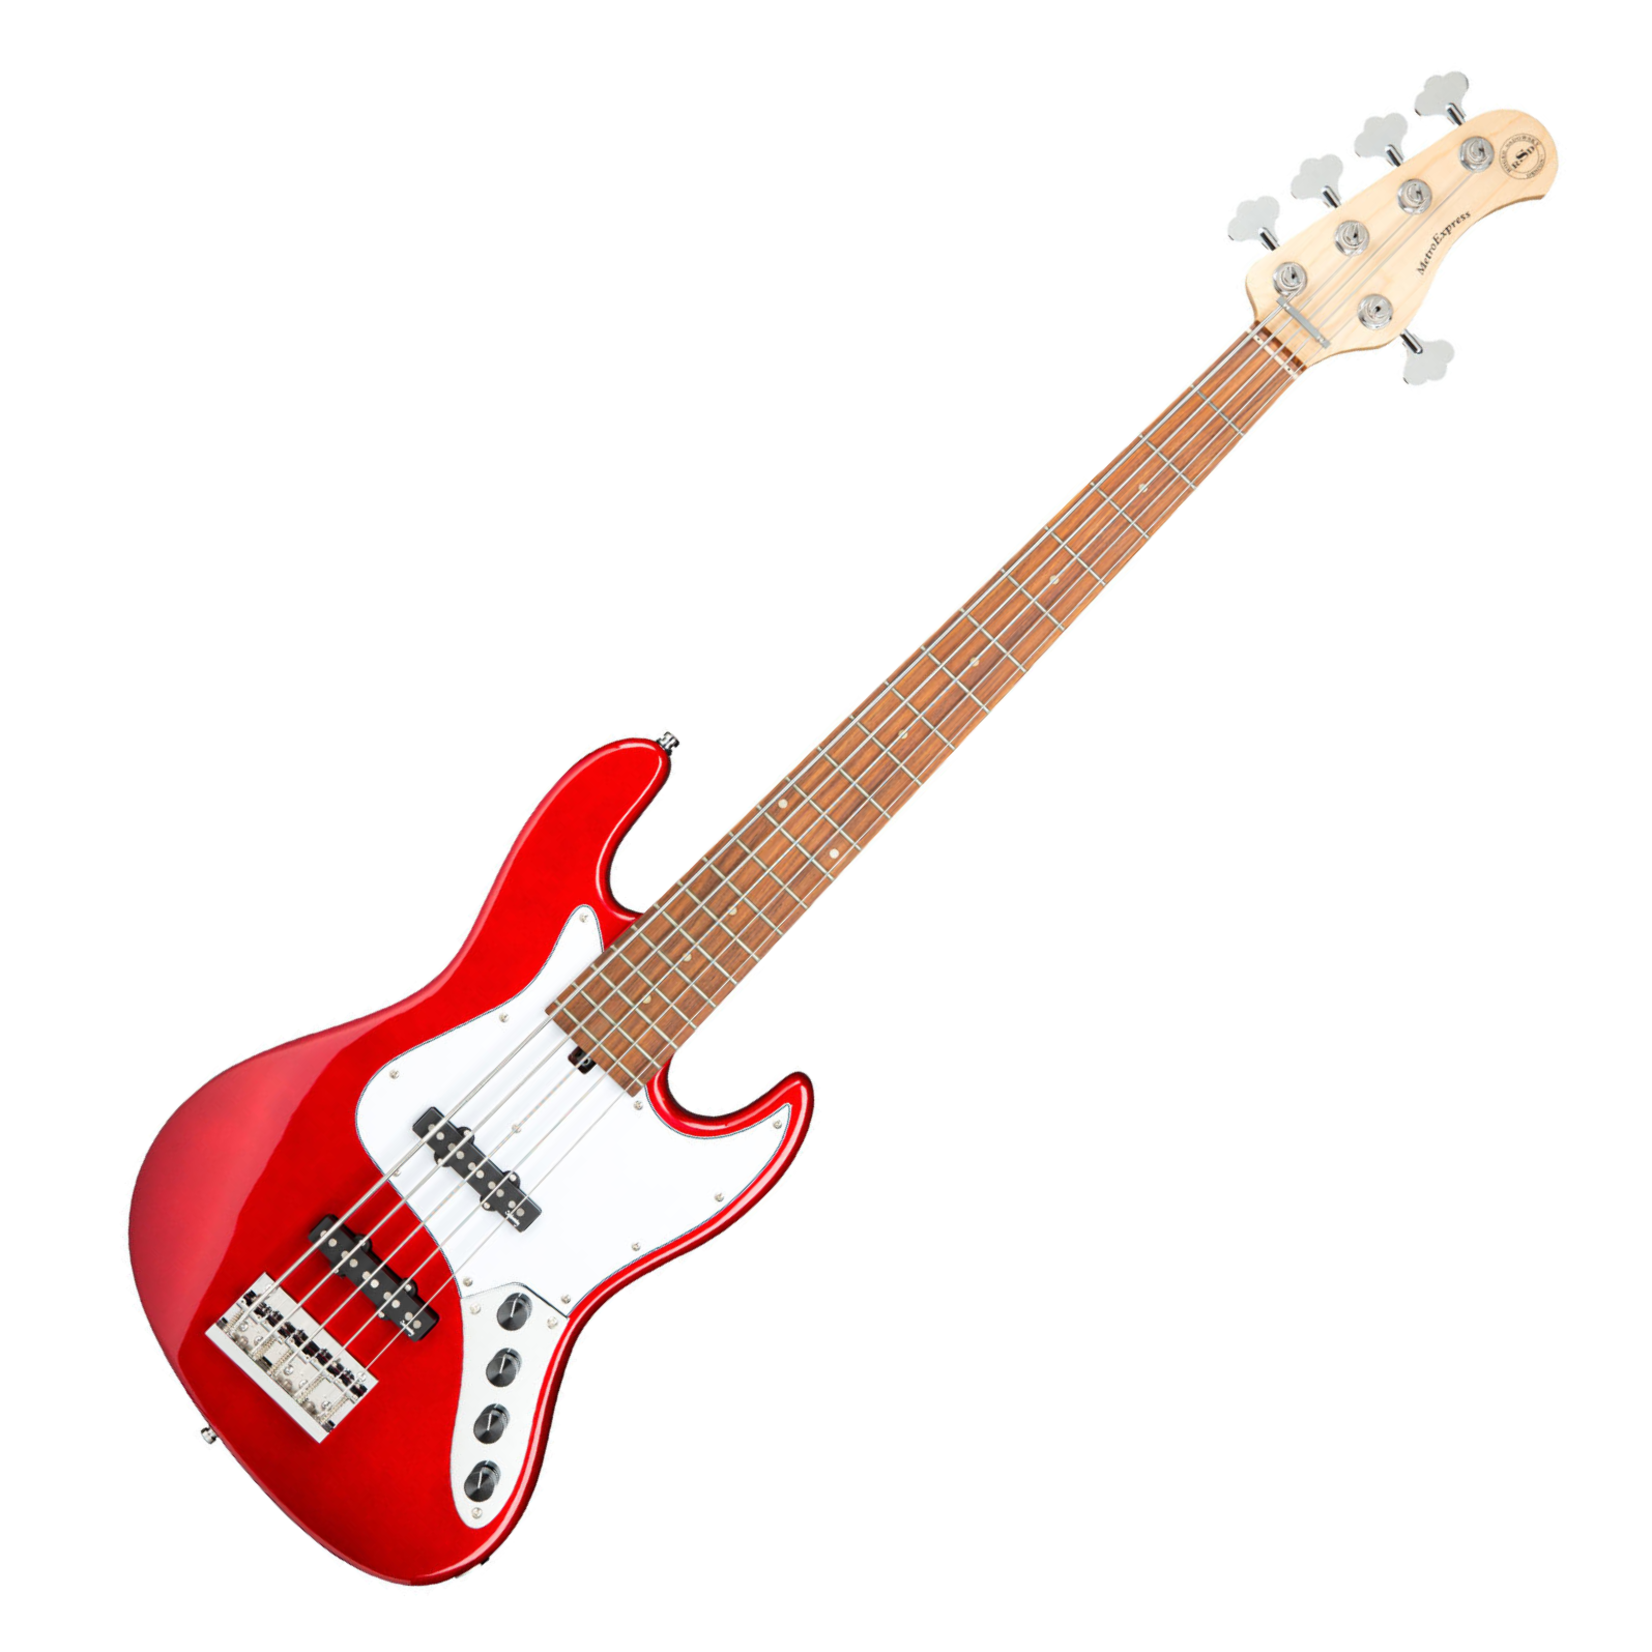 Sadowsky Sadowsky (RSD) MetroExpress 21-Fret J/J 5-String Bass , Candy Red Apple Metallic High Polish, Morado Fingerboard